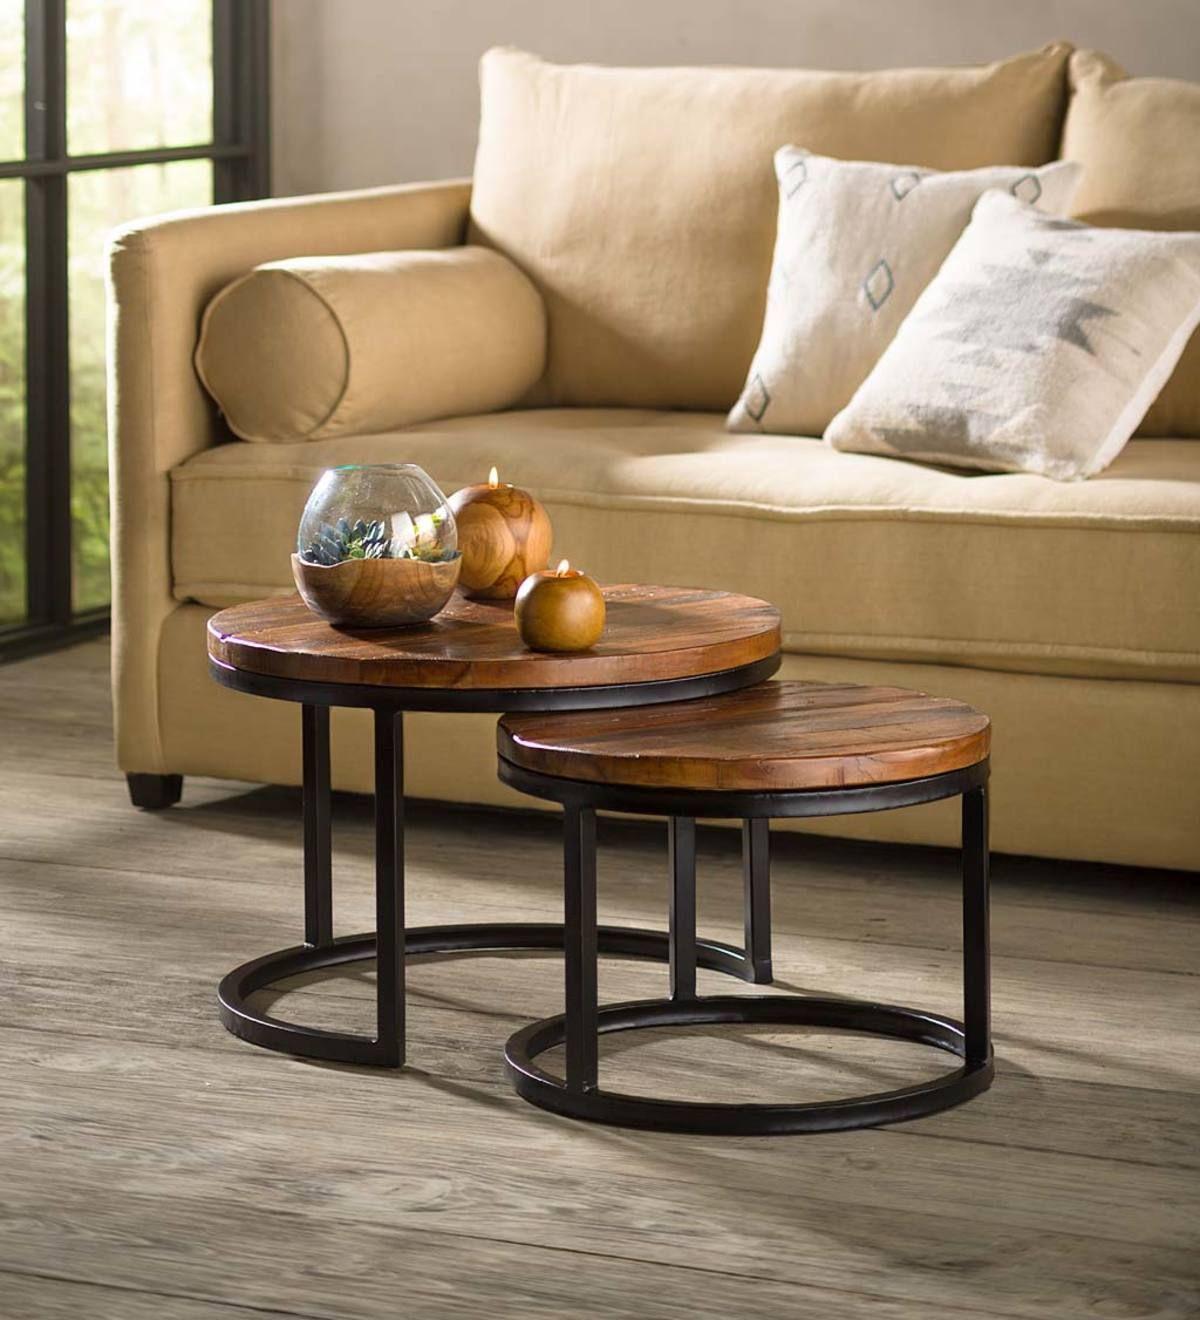 Knox Round Nesting Coffee Tables Set Of 2 Coffee Table Nesting Coffee Tables Round Coffee Table Living Room [ 2000 x 2000 Pixel ]